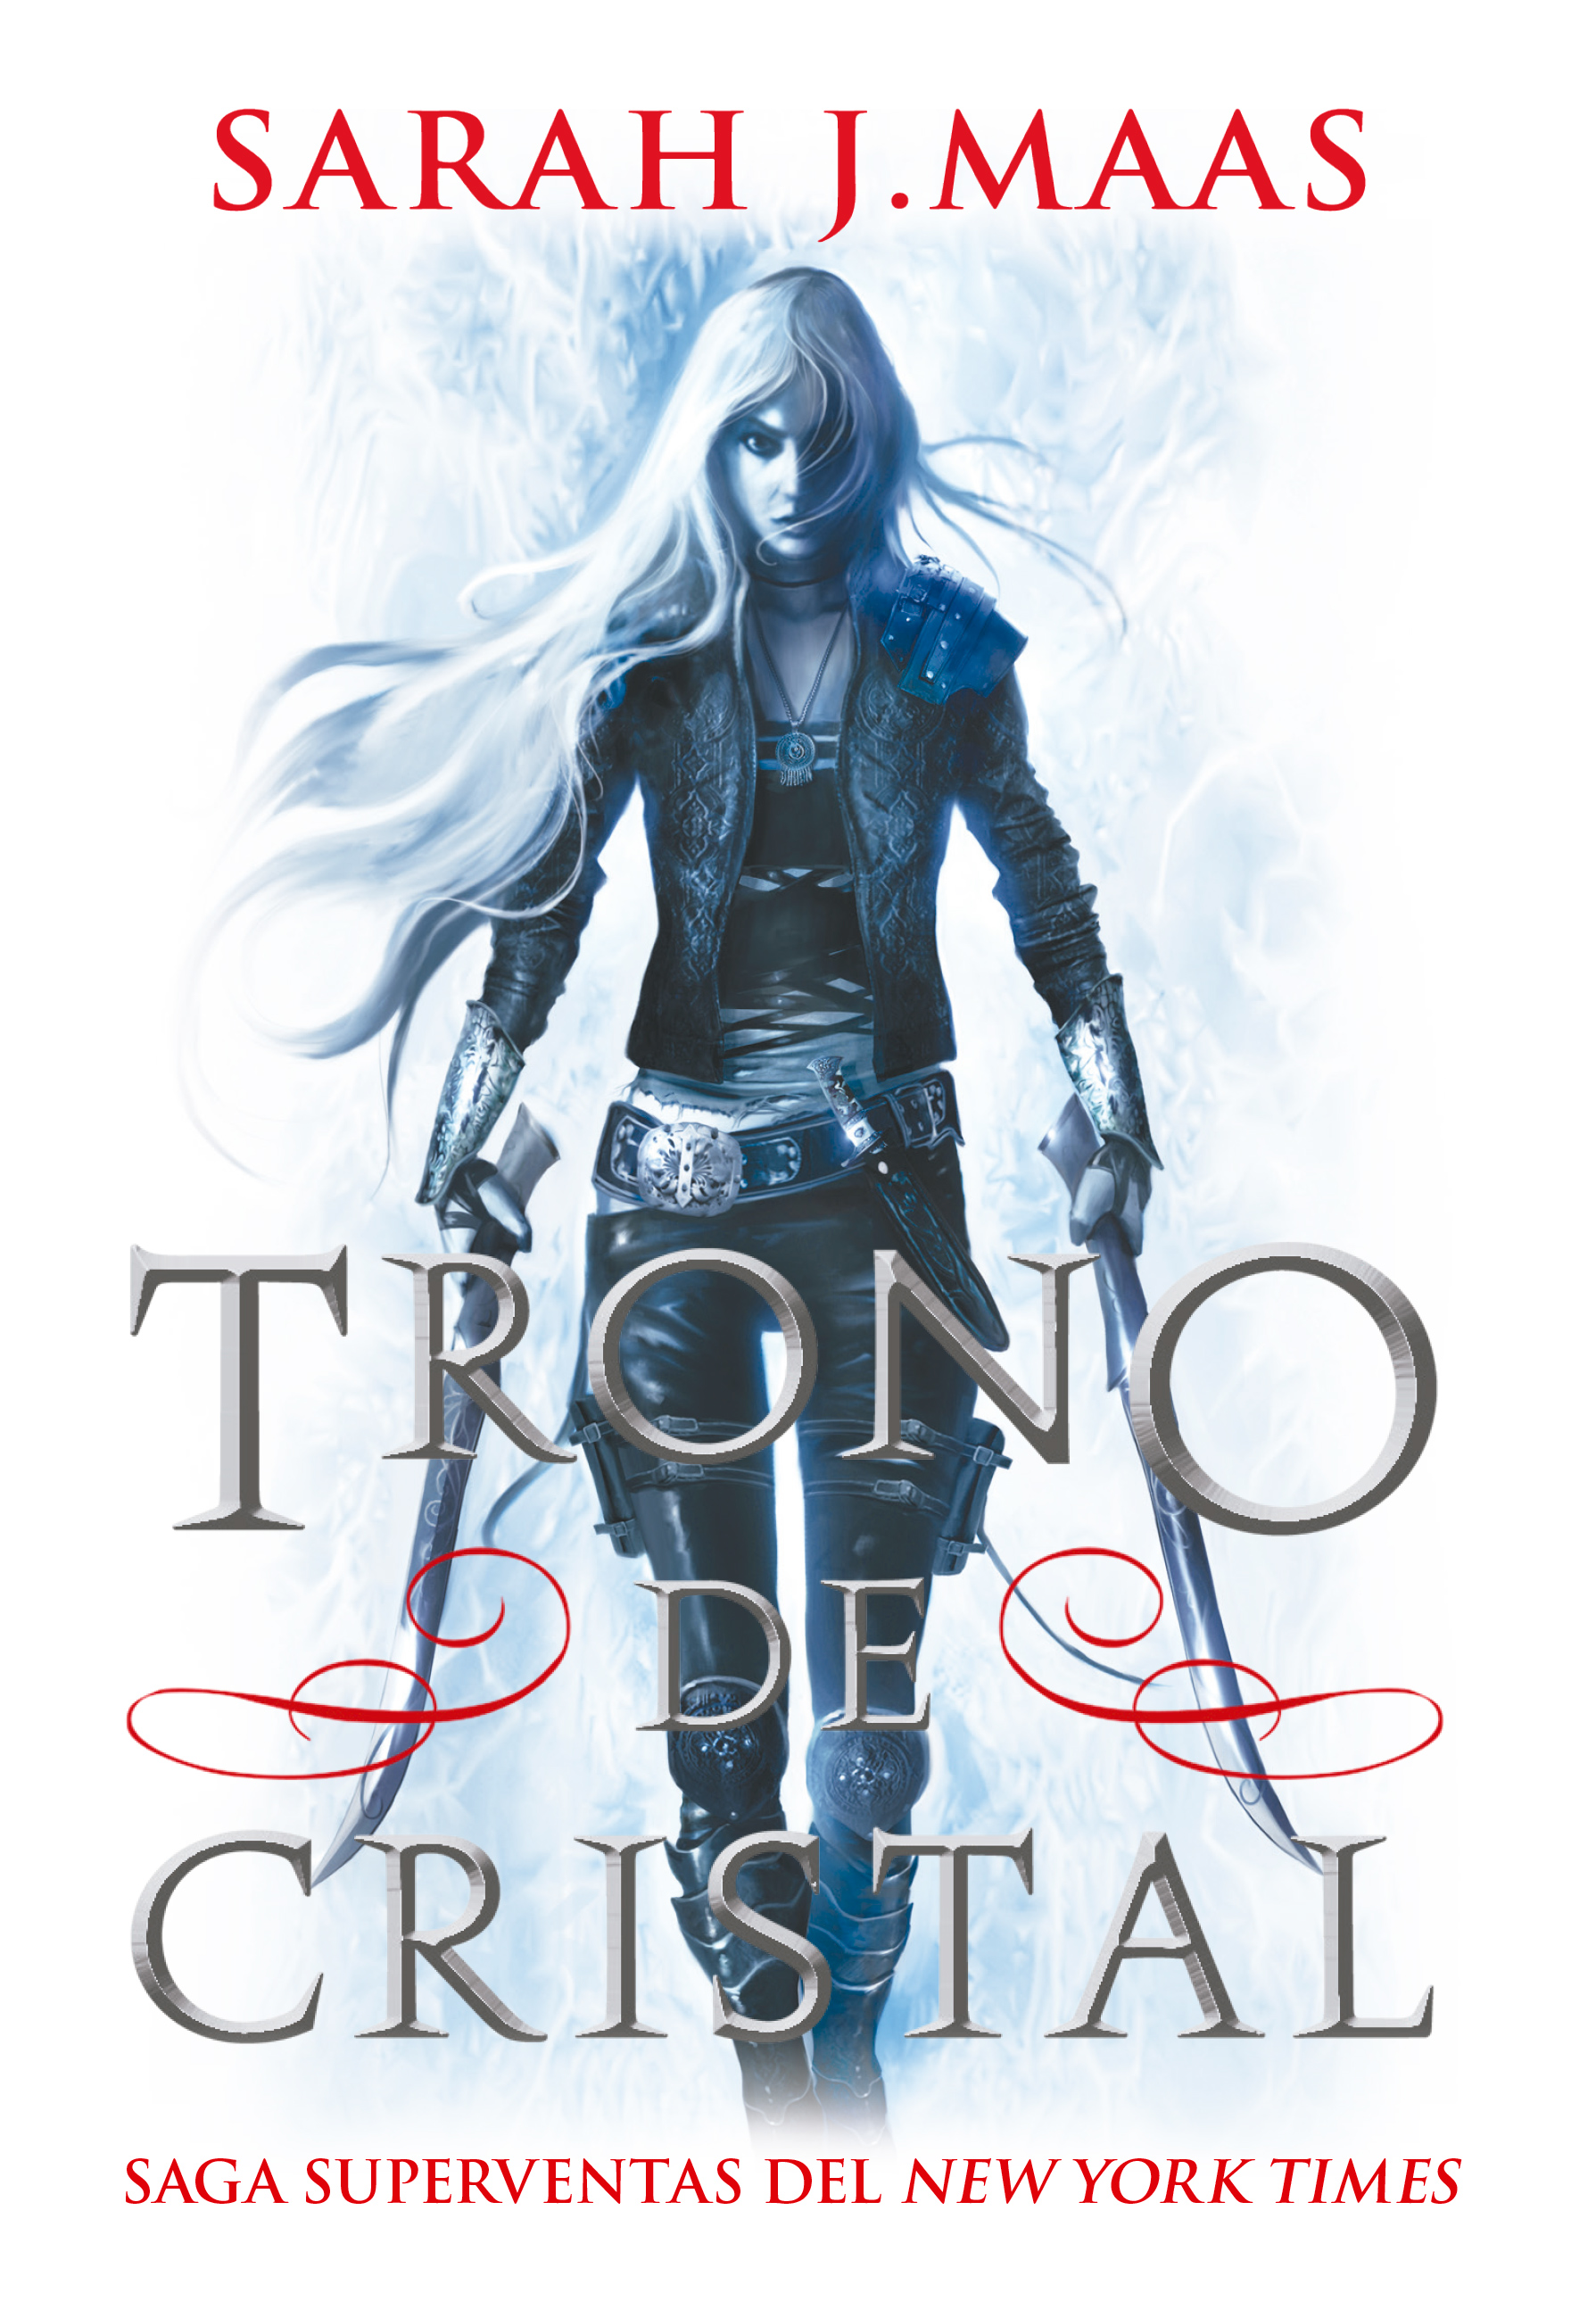 Trono de cristal, de Sarah J Maas